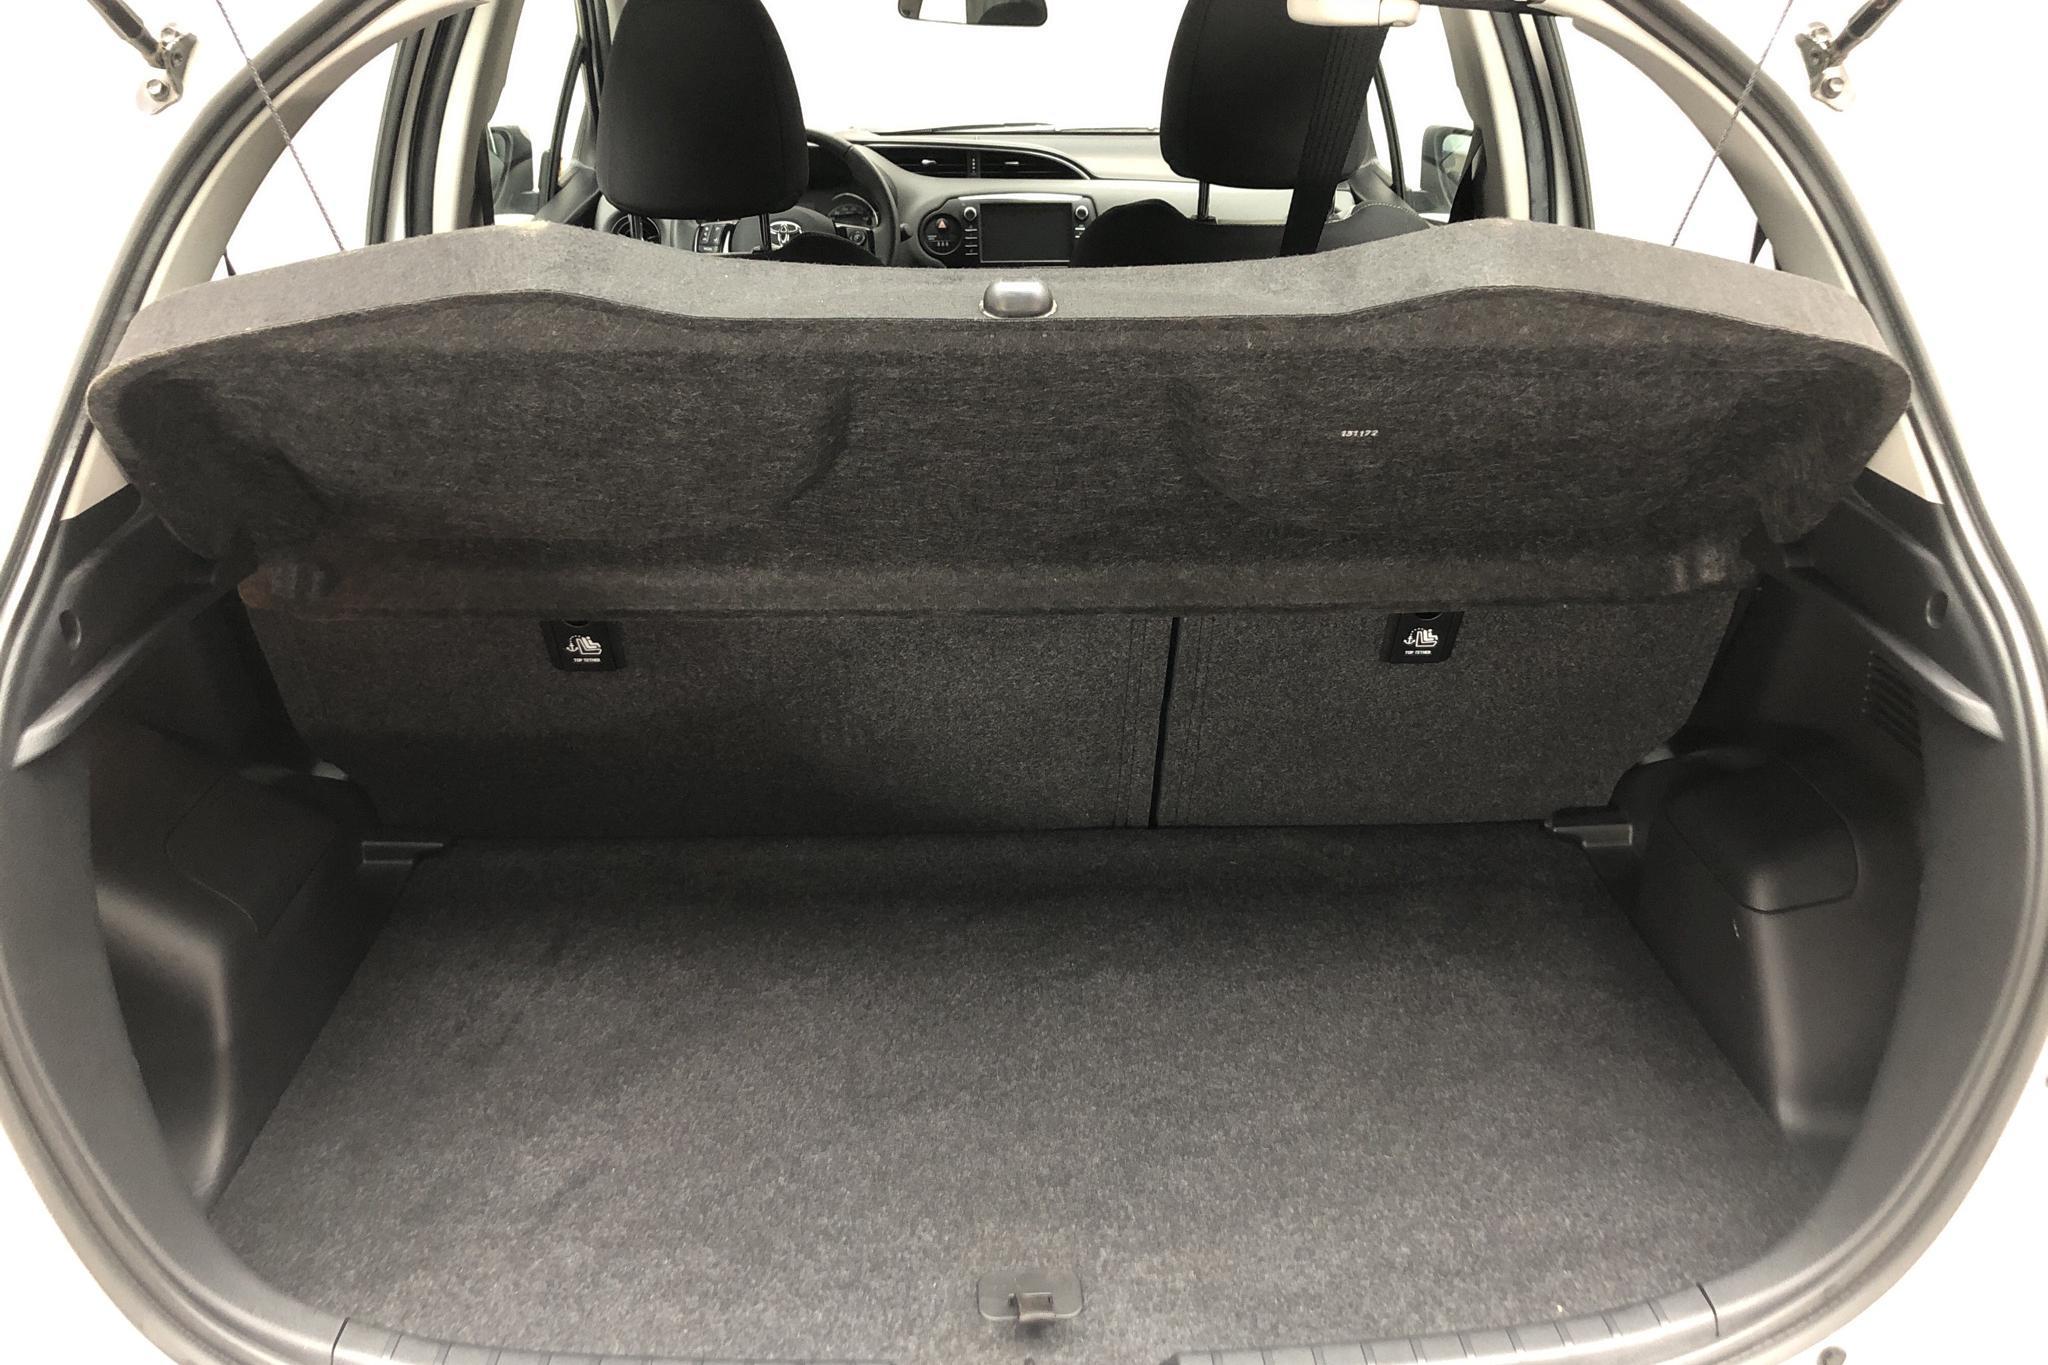 Toyota Yaris 1.5 Hybrid 5dr (101hk) - 32 700 km - Automatic - white - 2018